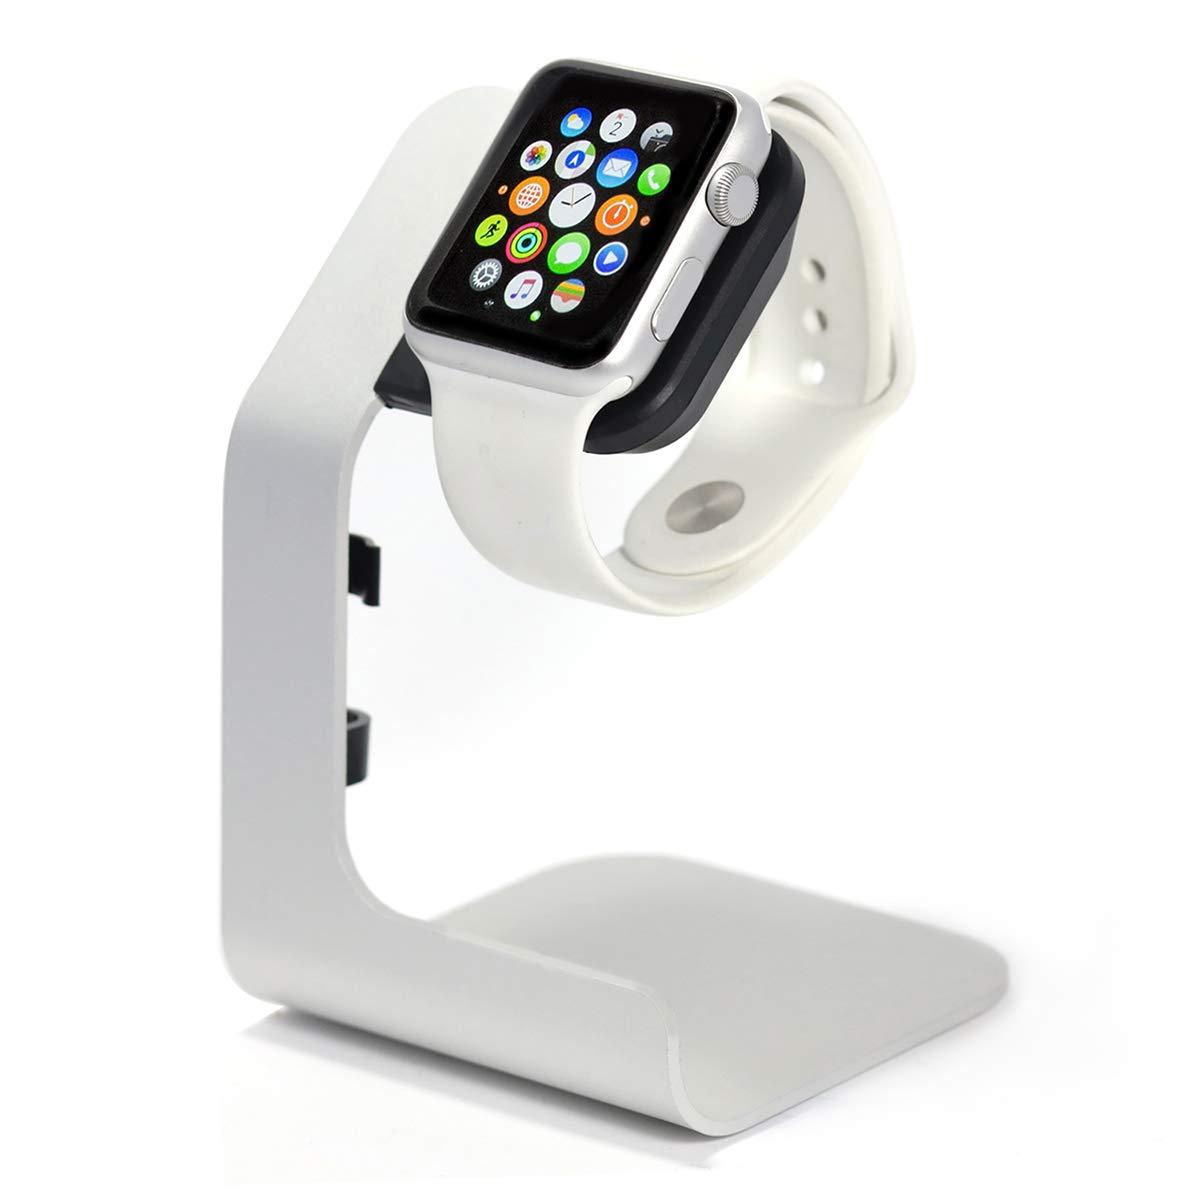 Apple Watch Stand-Tranesca Apple Watch charging stand for Series 5 / Series 4 / Series 3 / Series 2 / Series 1; 38mm/40mm/42mm/44mm Apple watch (Must have Apple watch Accessories)